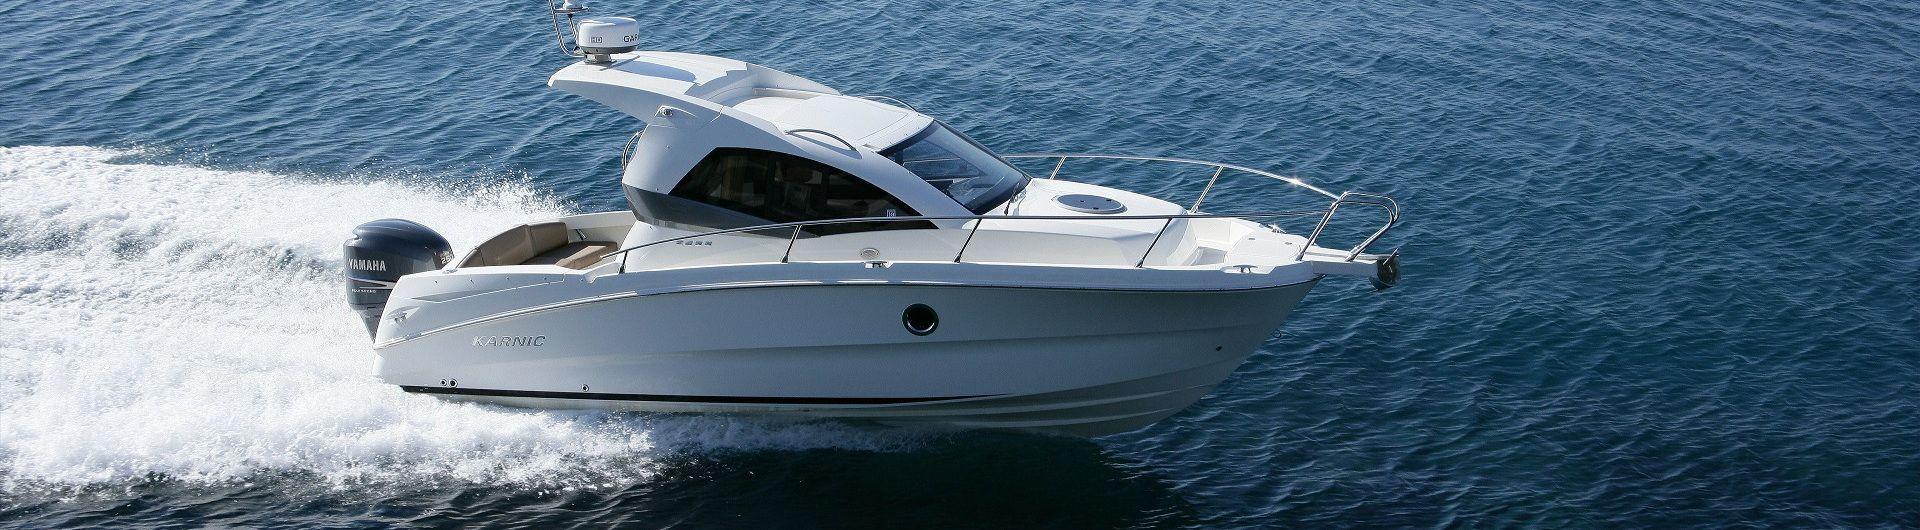 Sportboot Karnic 2455 Header